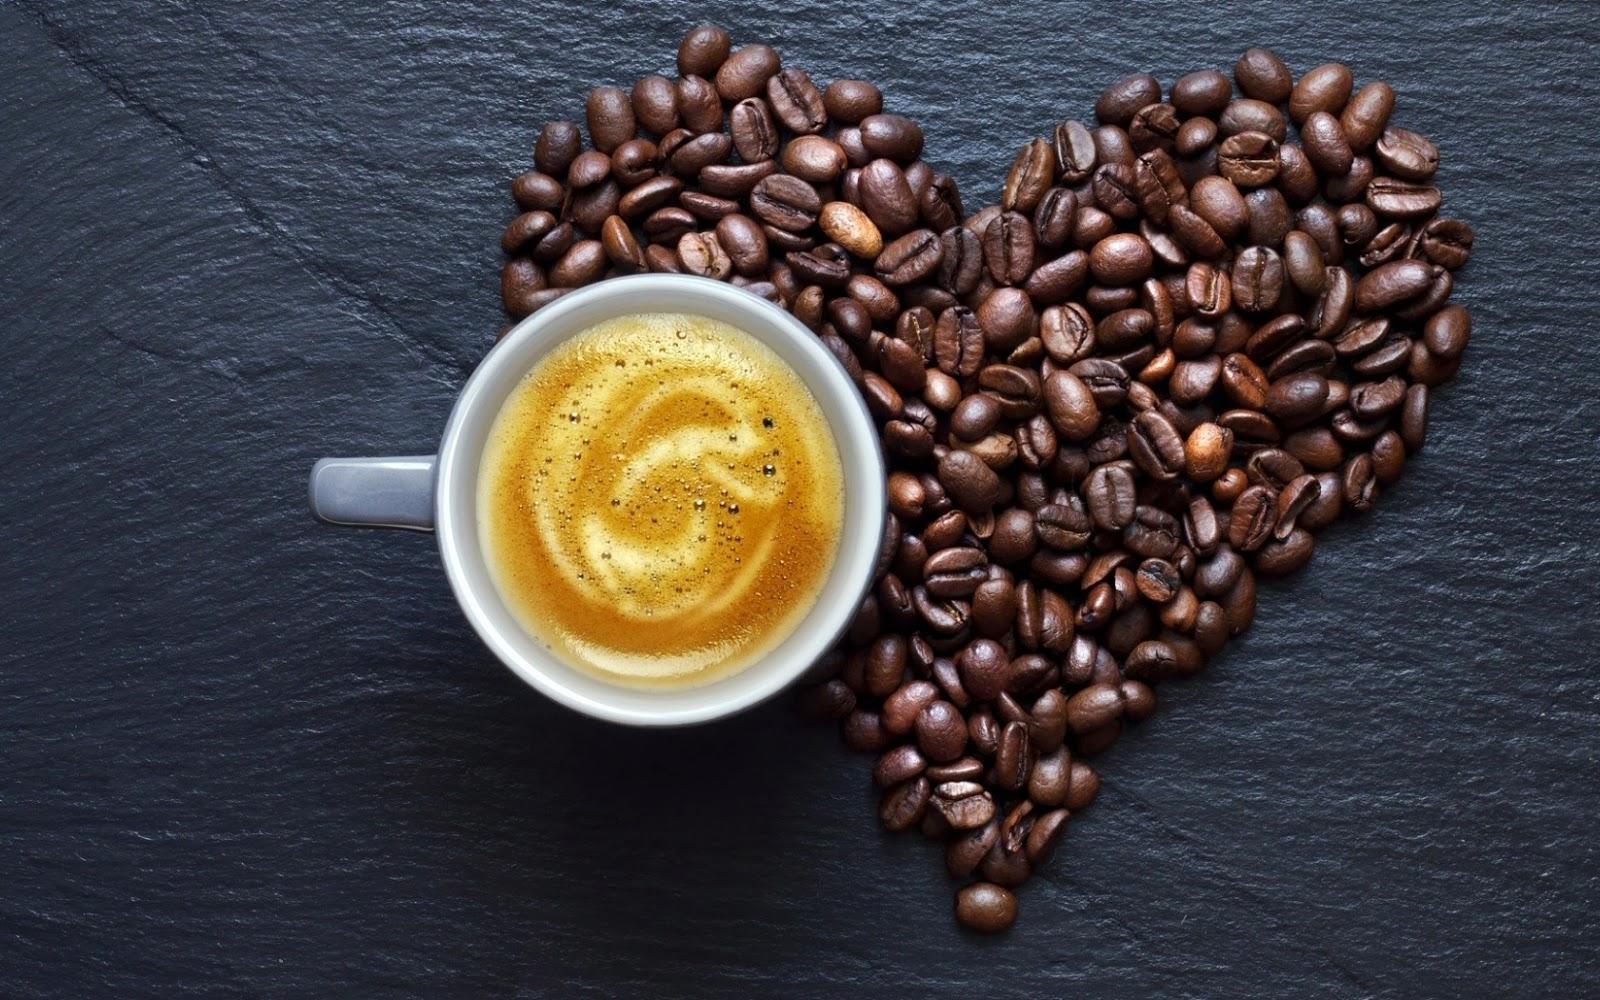 Café amor